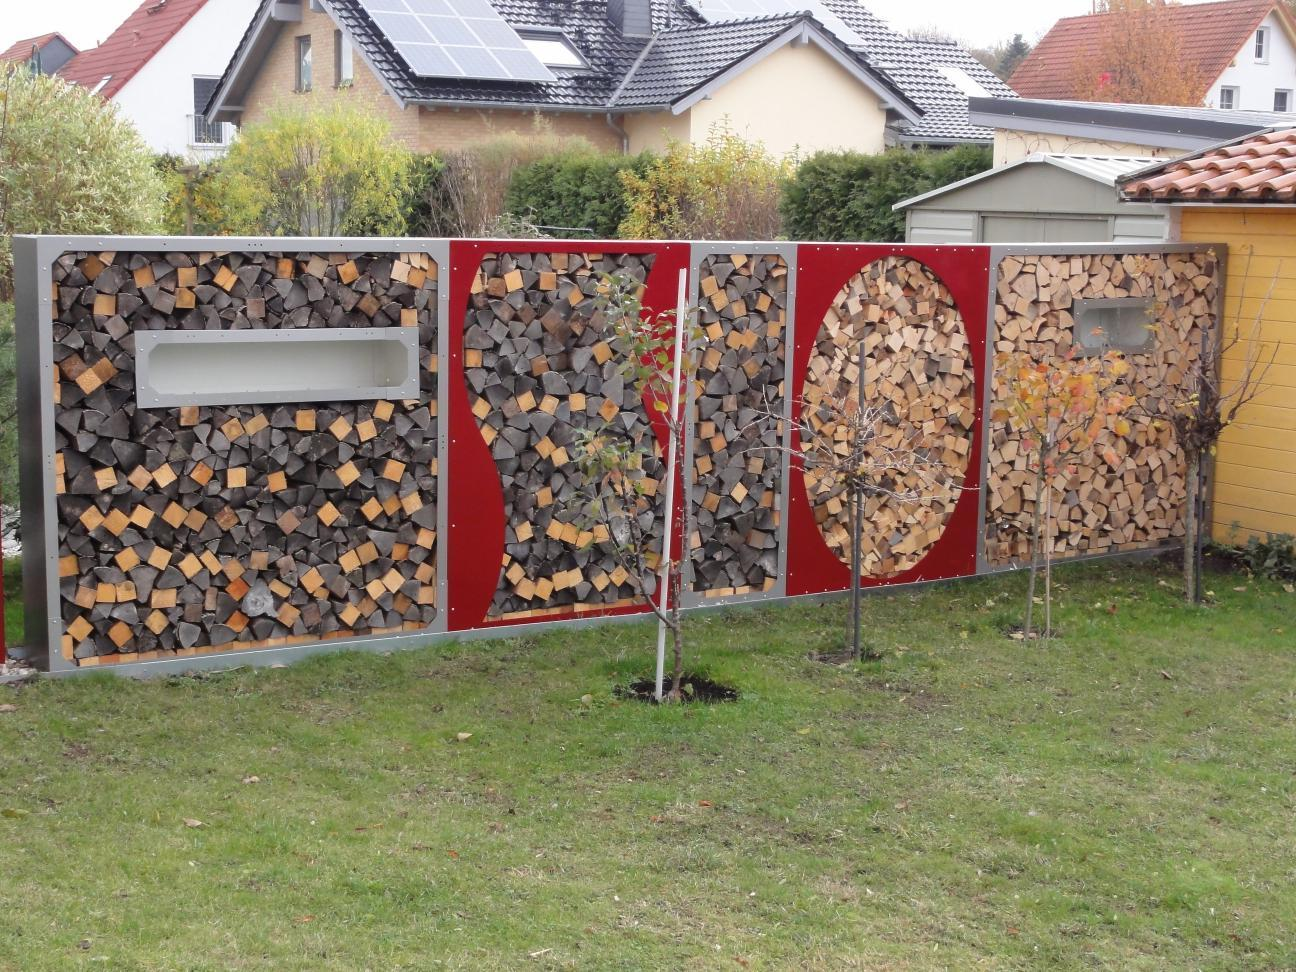 Kaminholzregal metall 1 9 m x 1 2 m farbe nach farbkarte for Garten pool 2m tief